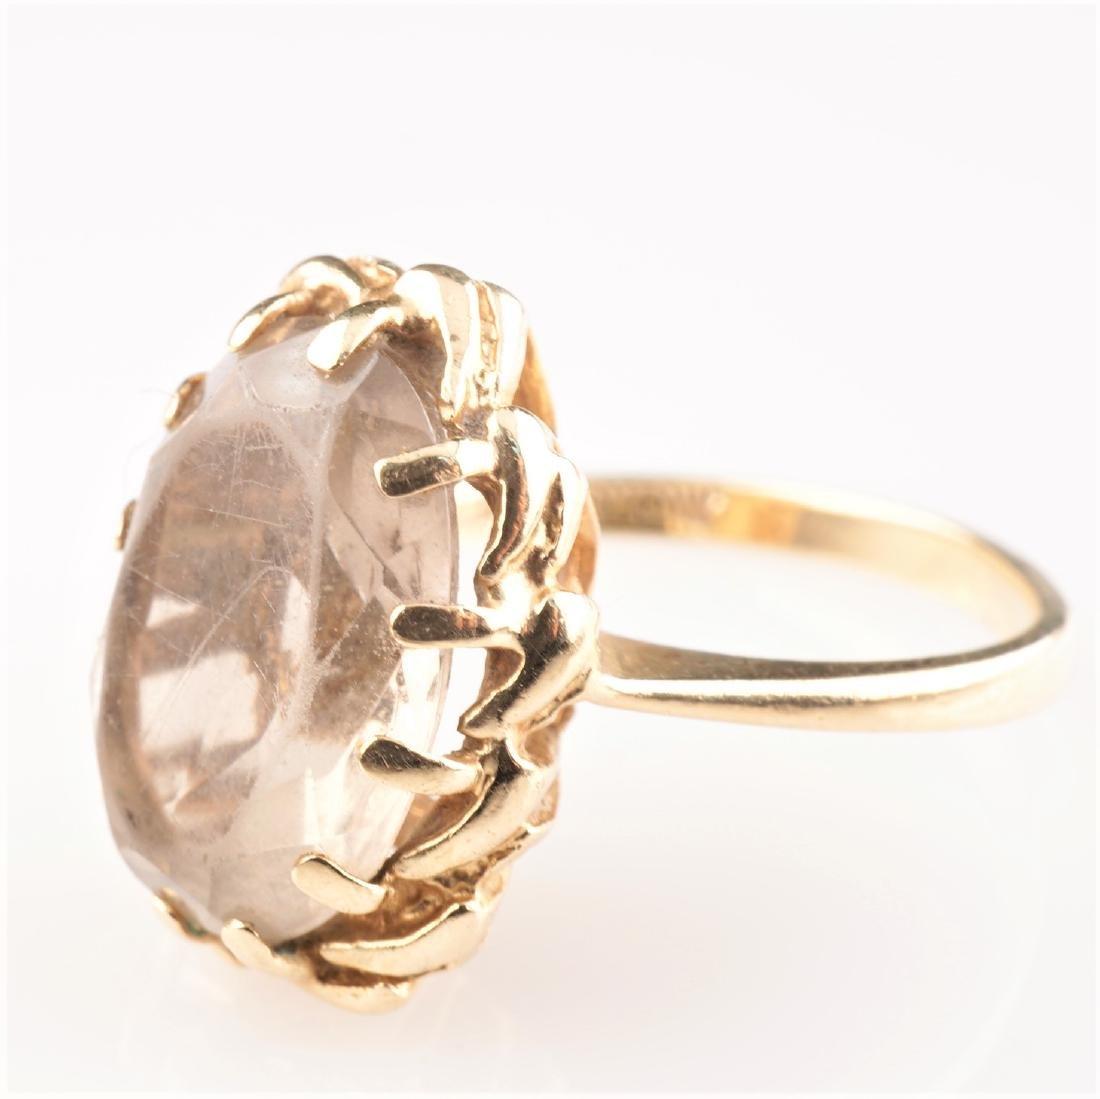 Smoky Quartz Ring in Yellow Gold sz 6